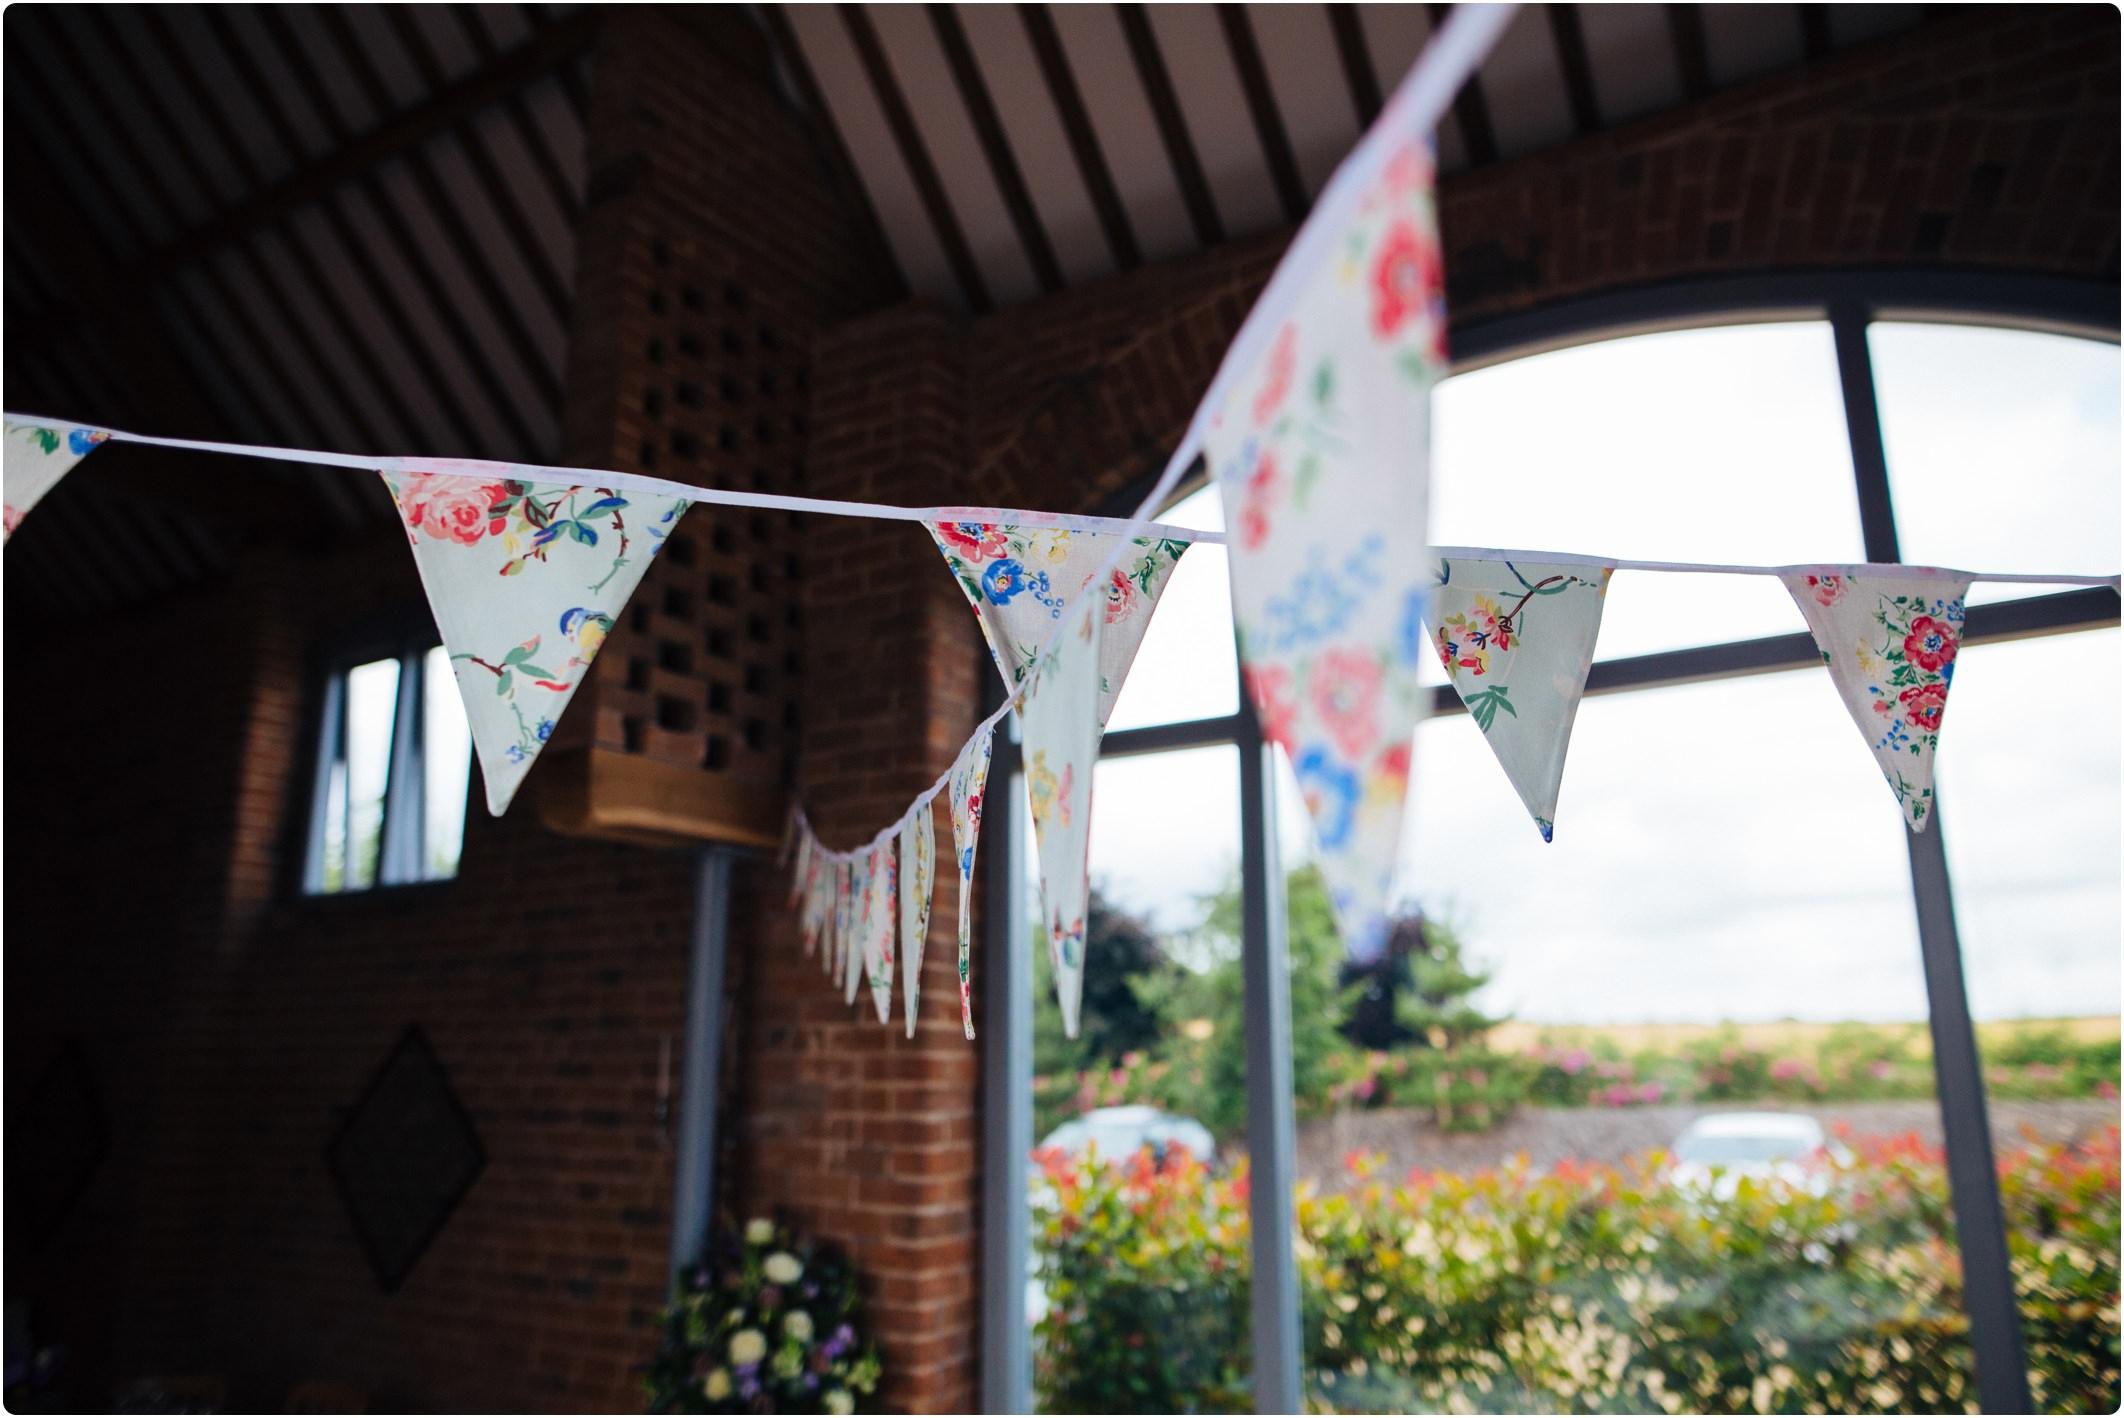 Swallows Nest Barn bunting